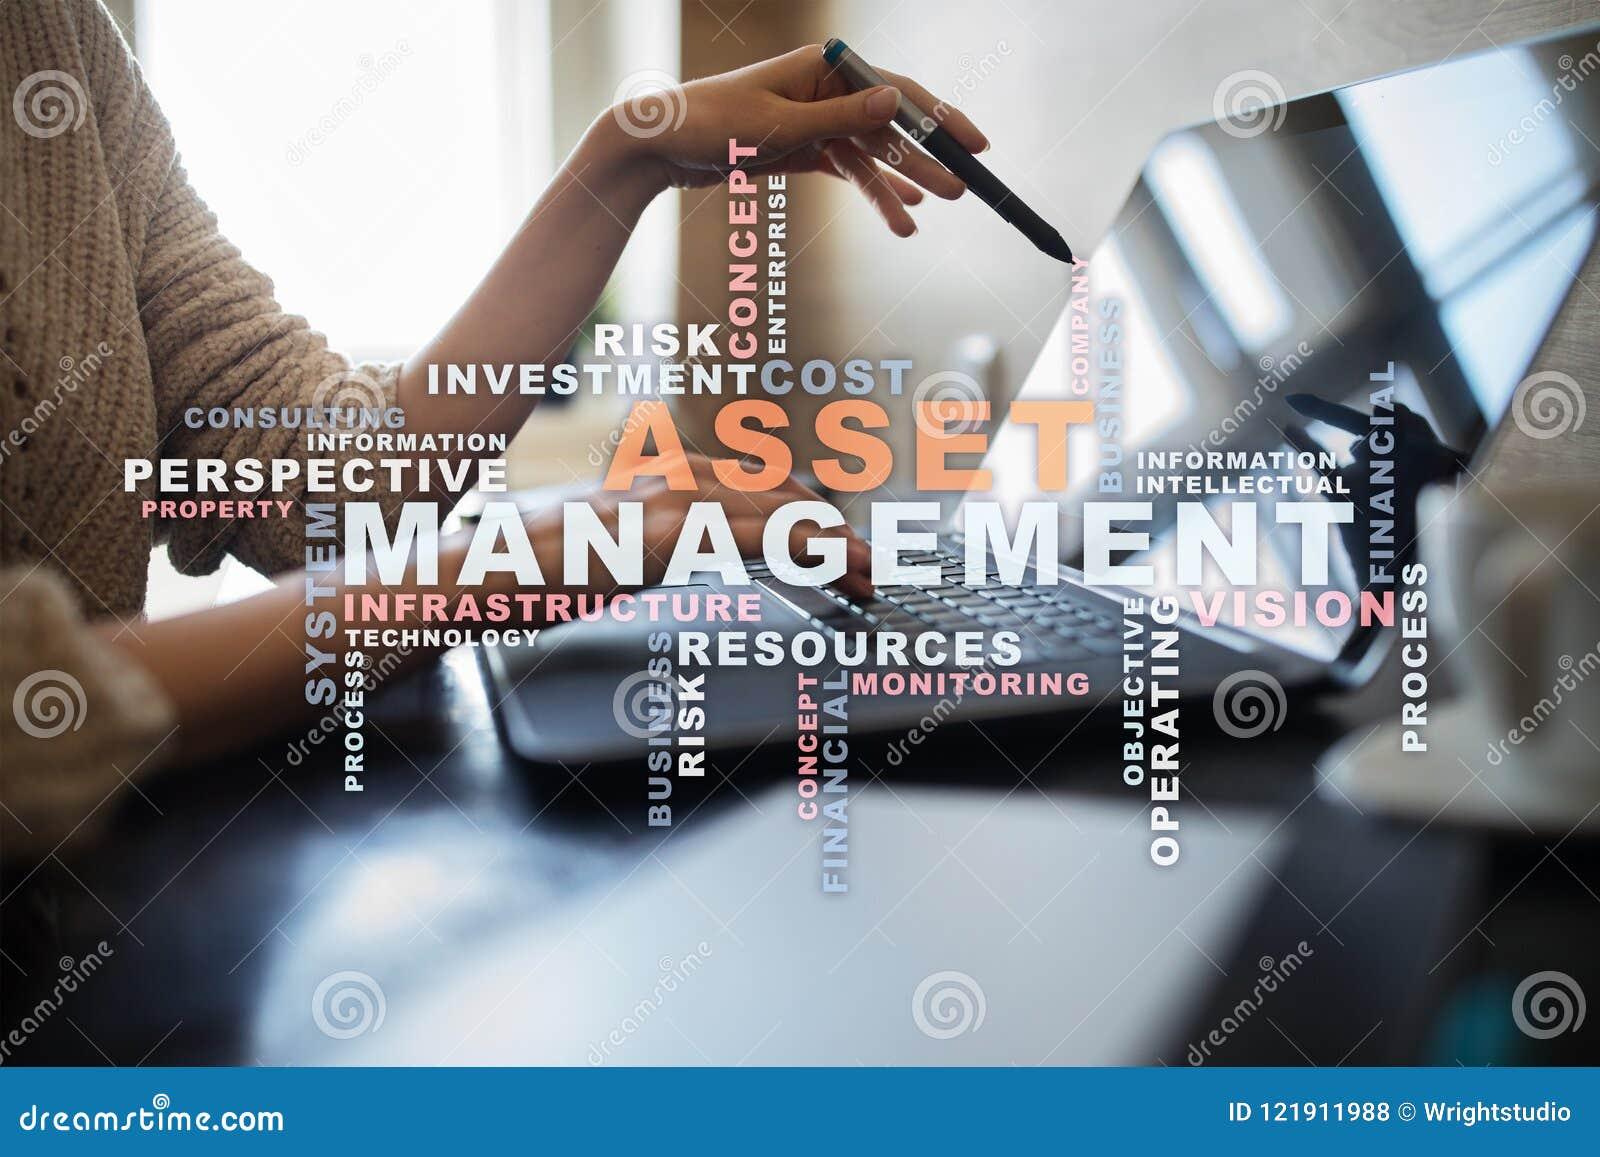 Asset management on the virtual screen. Business concept. Words cloud.